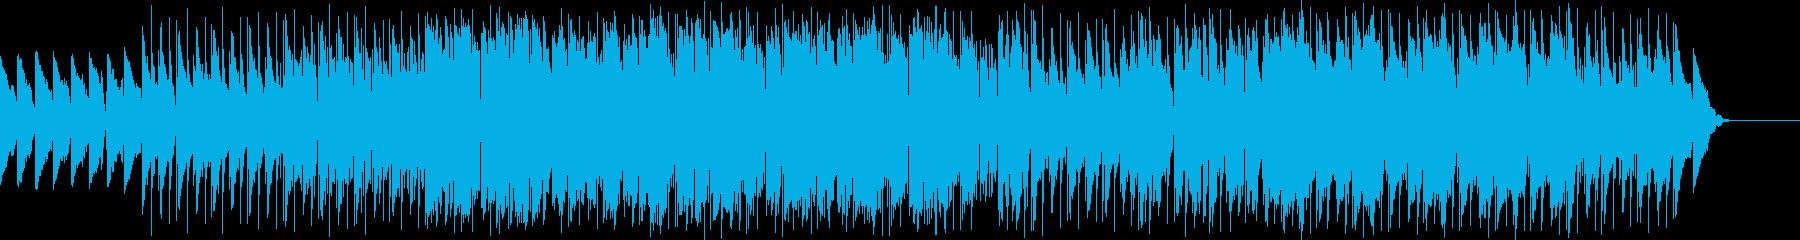 R&Bっぽいギターのトラックの再生済みの波形